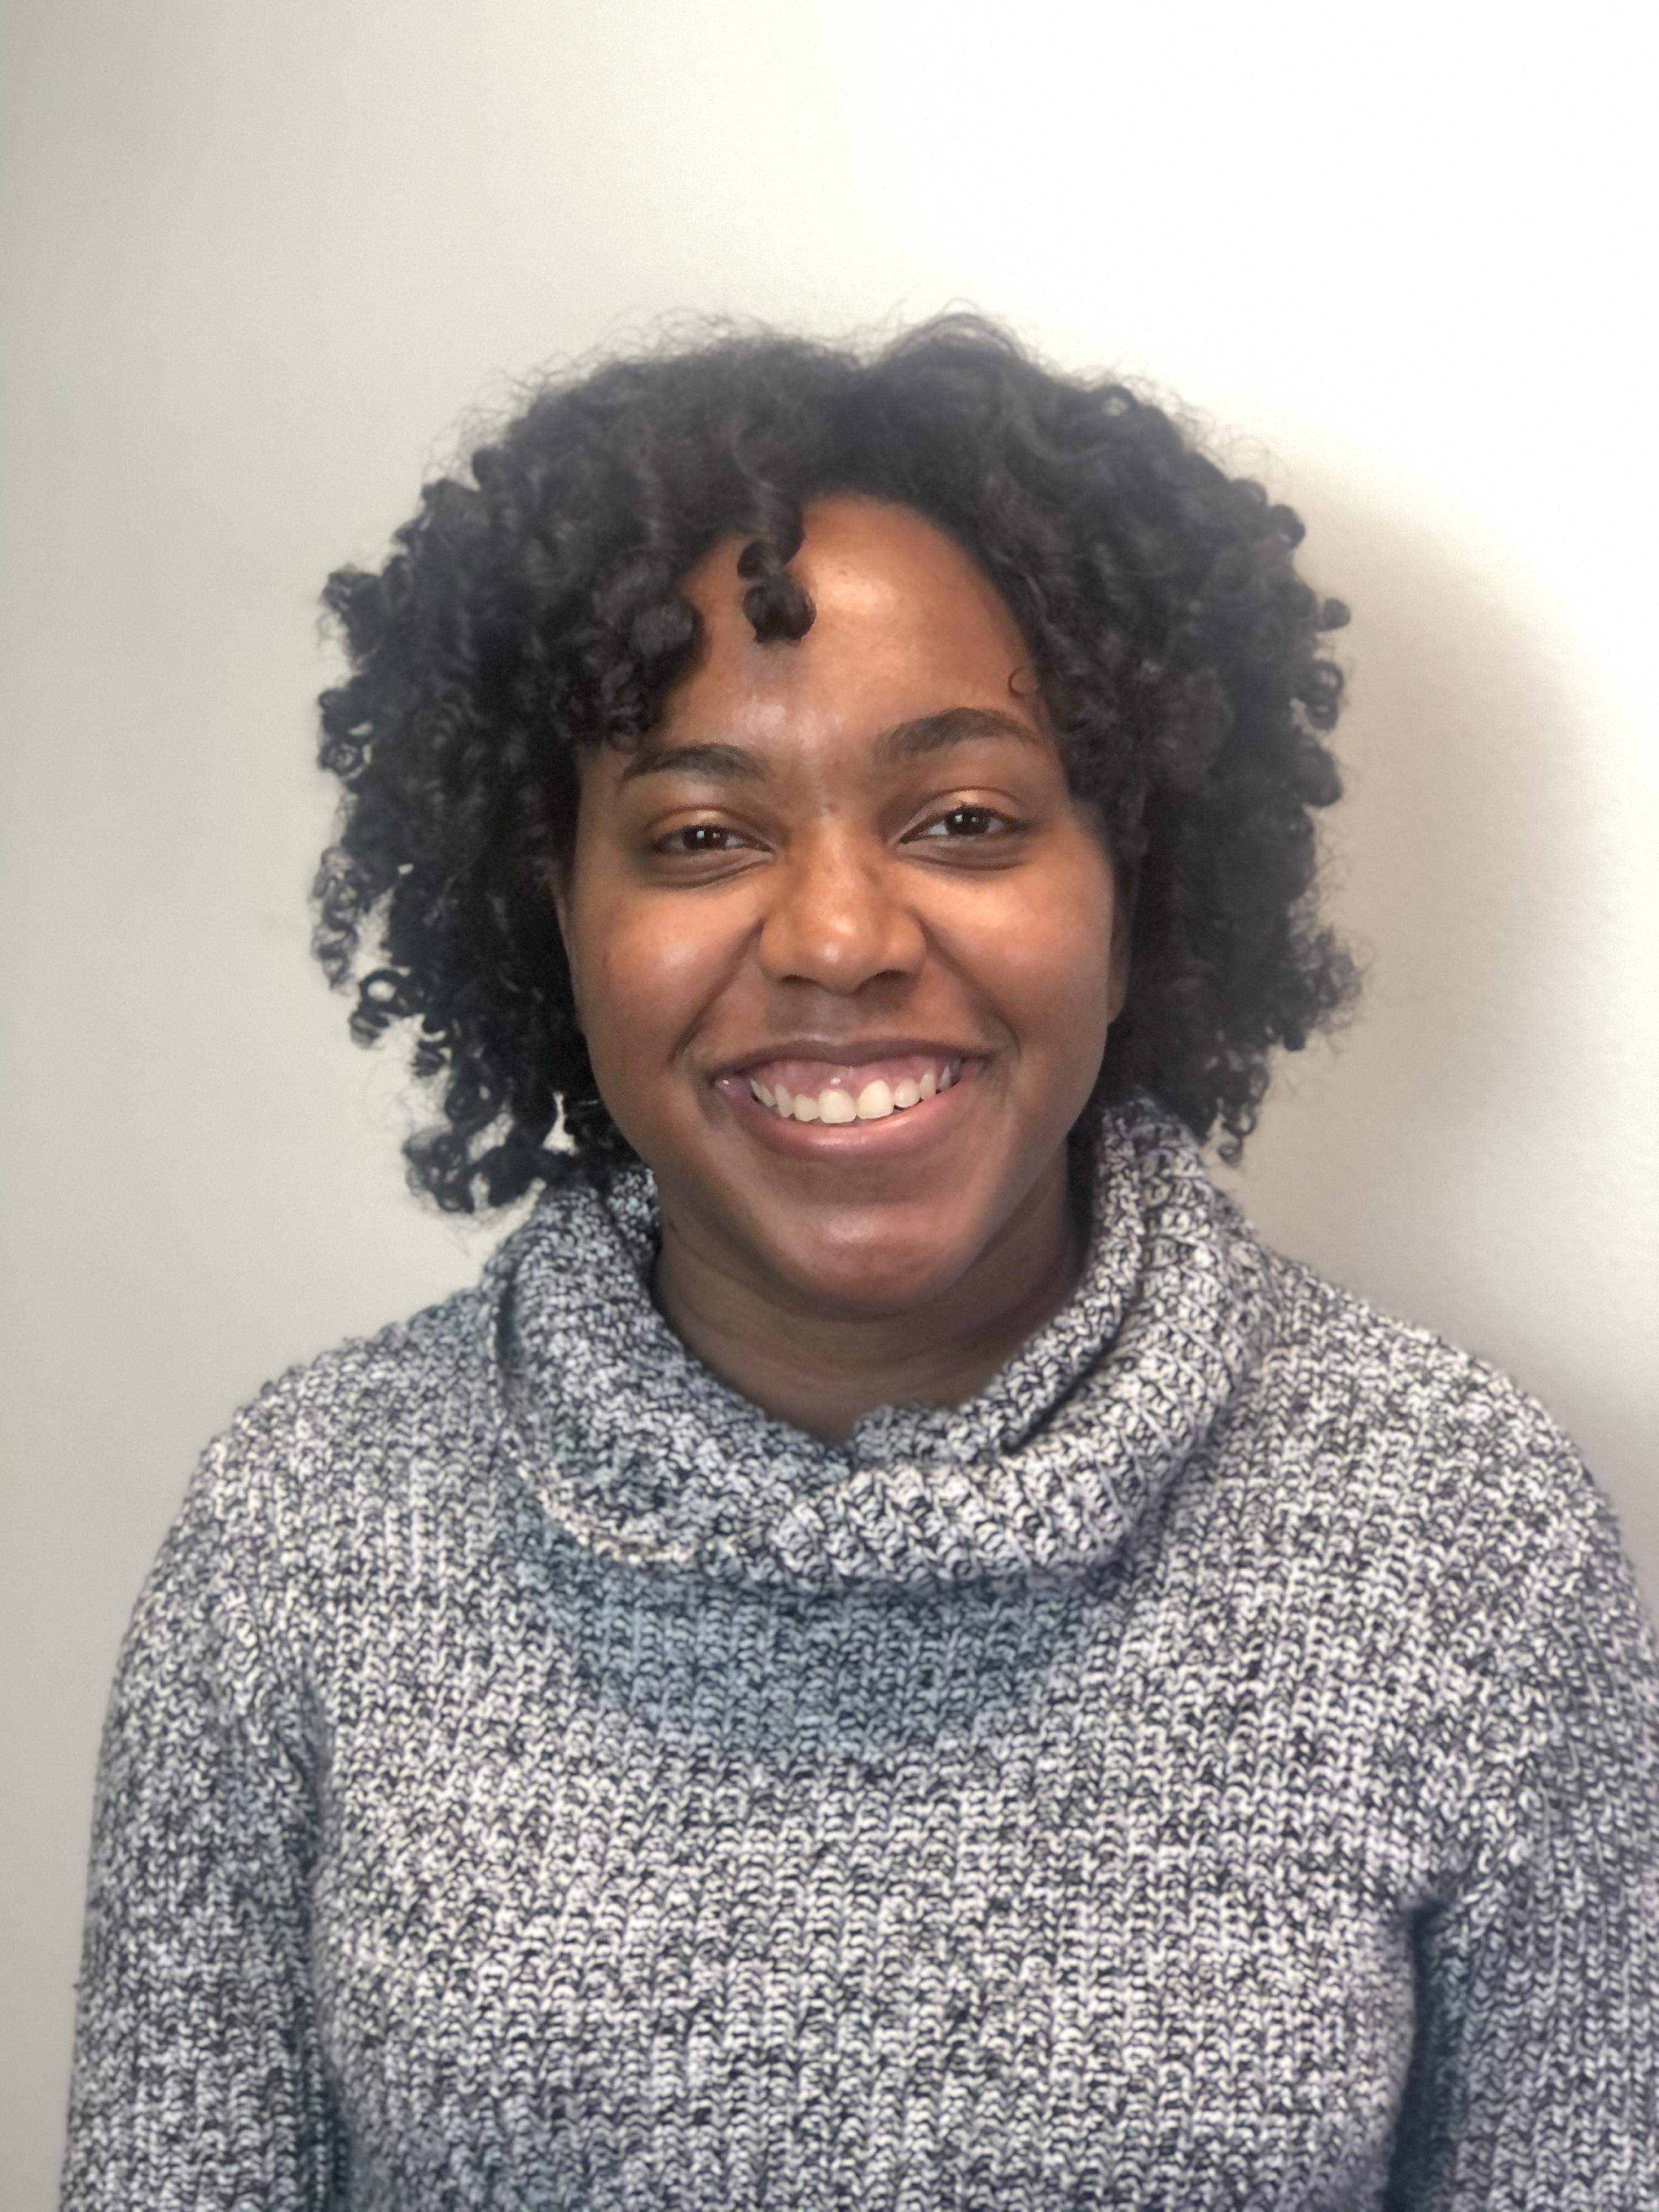 Brittney Ikeh Administrative Assistant - Pli's Senior Leader